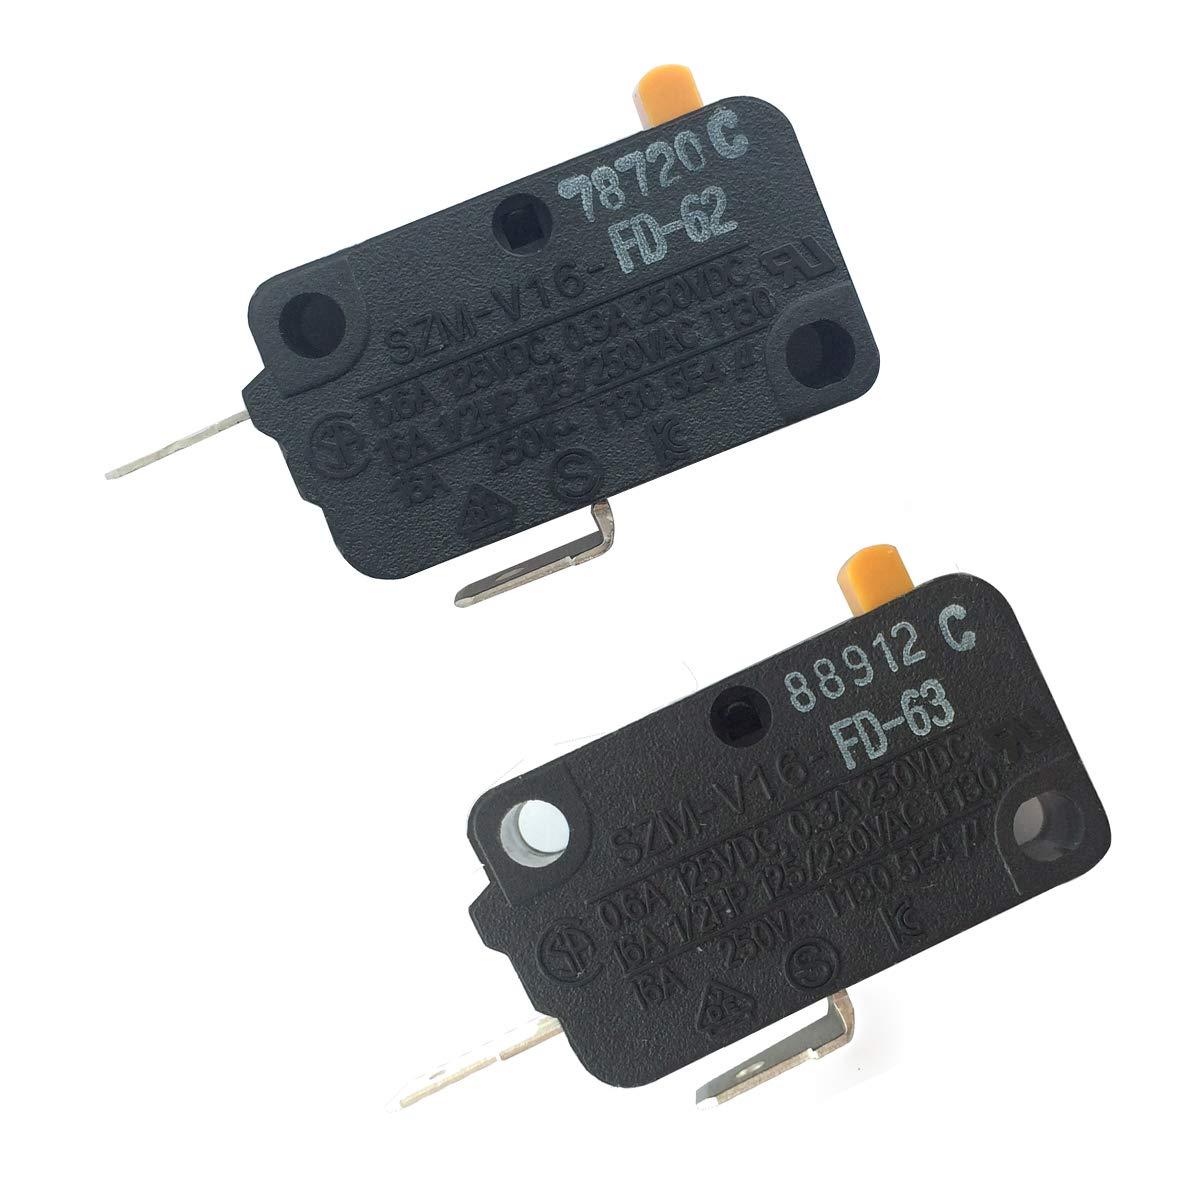 LONYE SZM-V16-FD-62 SZM-V16-FD-63 Microwave Switch for GE Starion Microwave